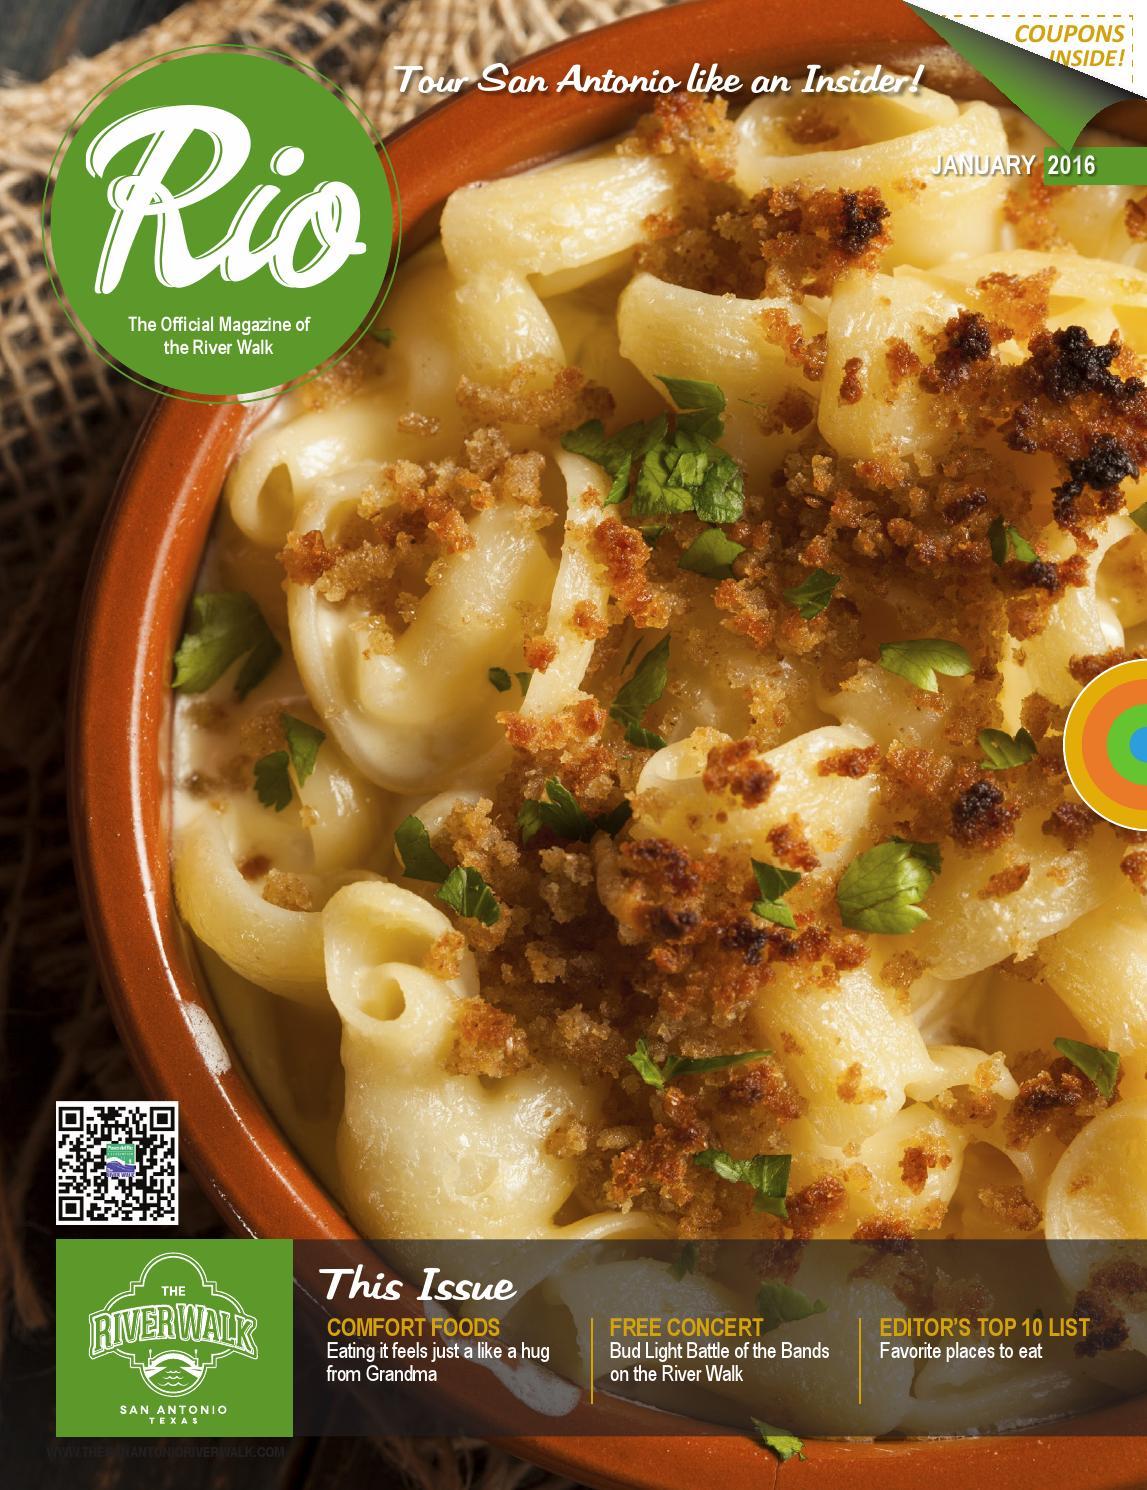 rio magazine january 2016 by traveling blender - issuu